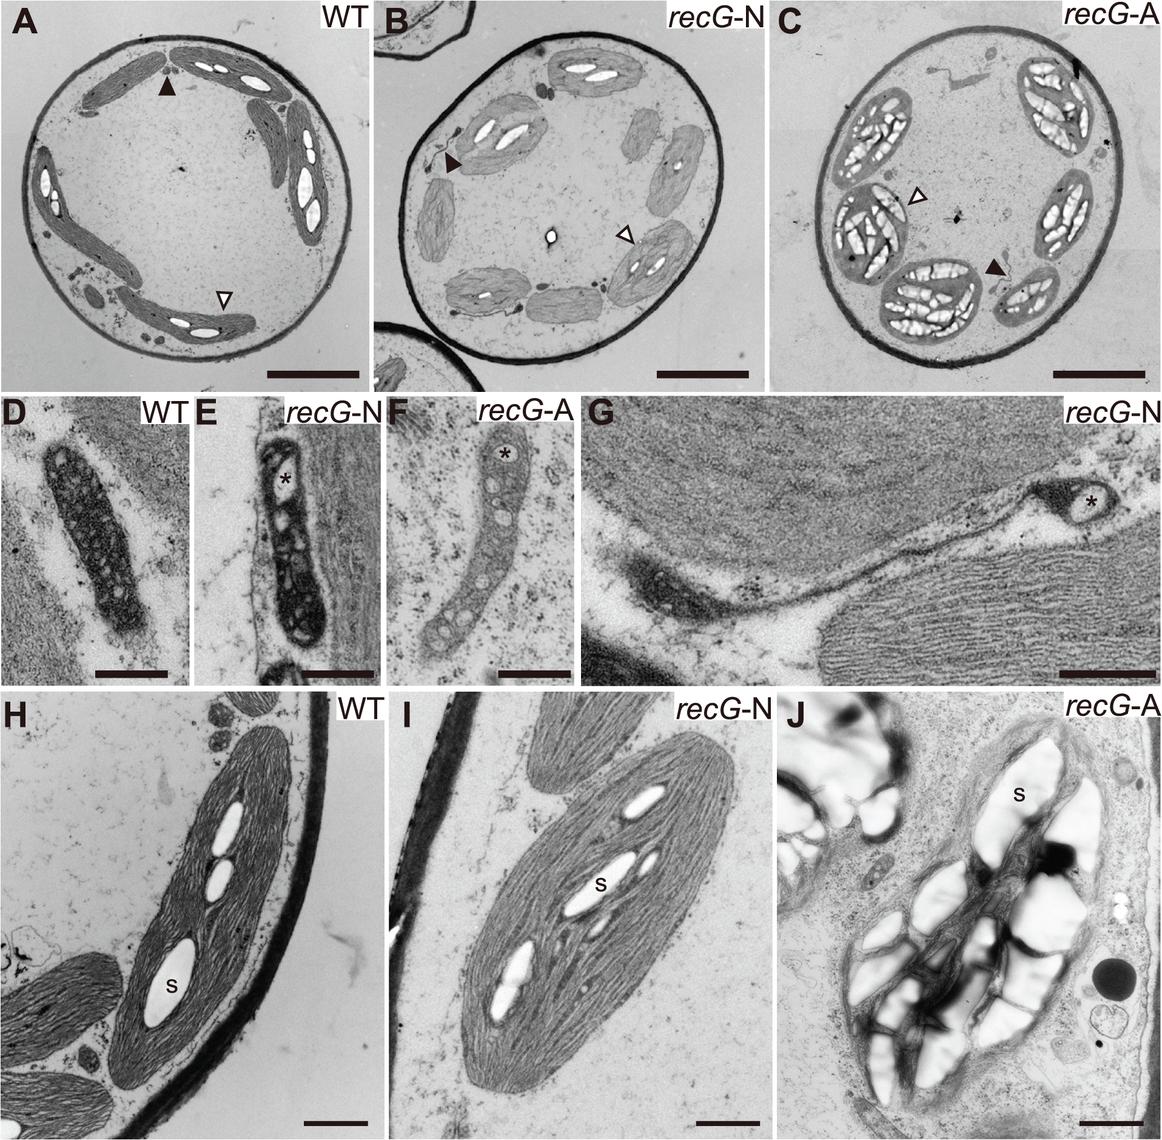 Ultrastructure of <i>RECG</i> KO protonemal cells.